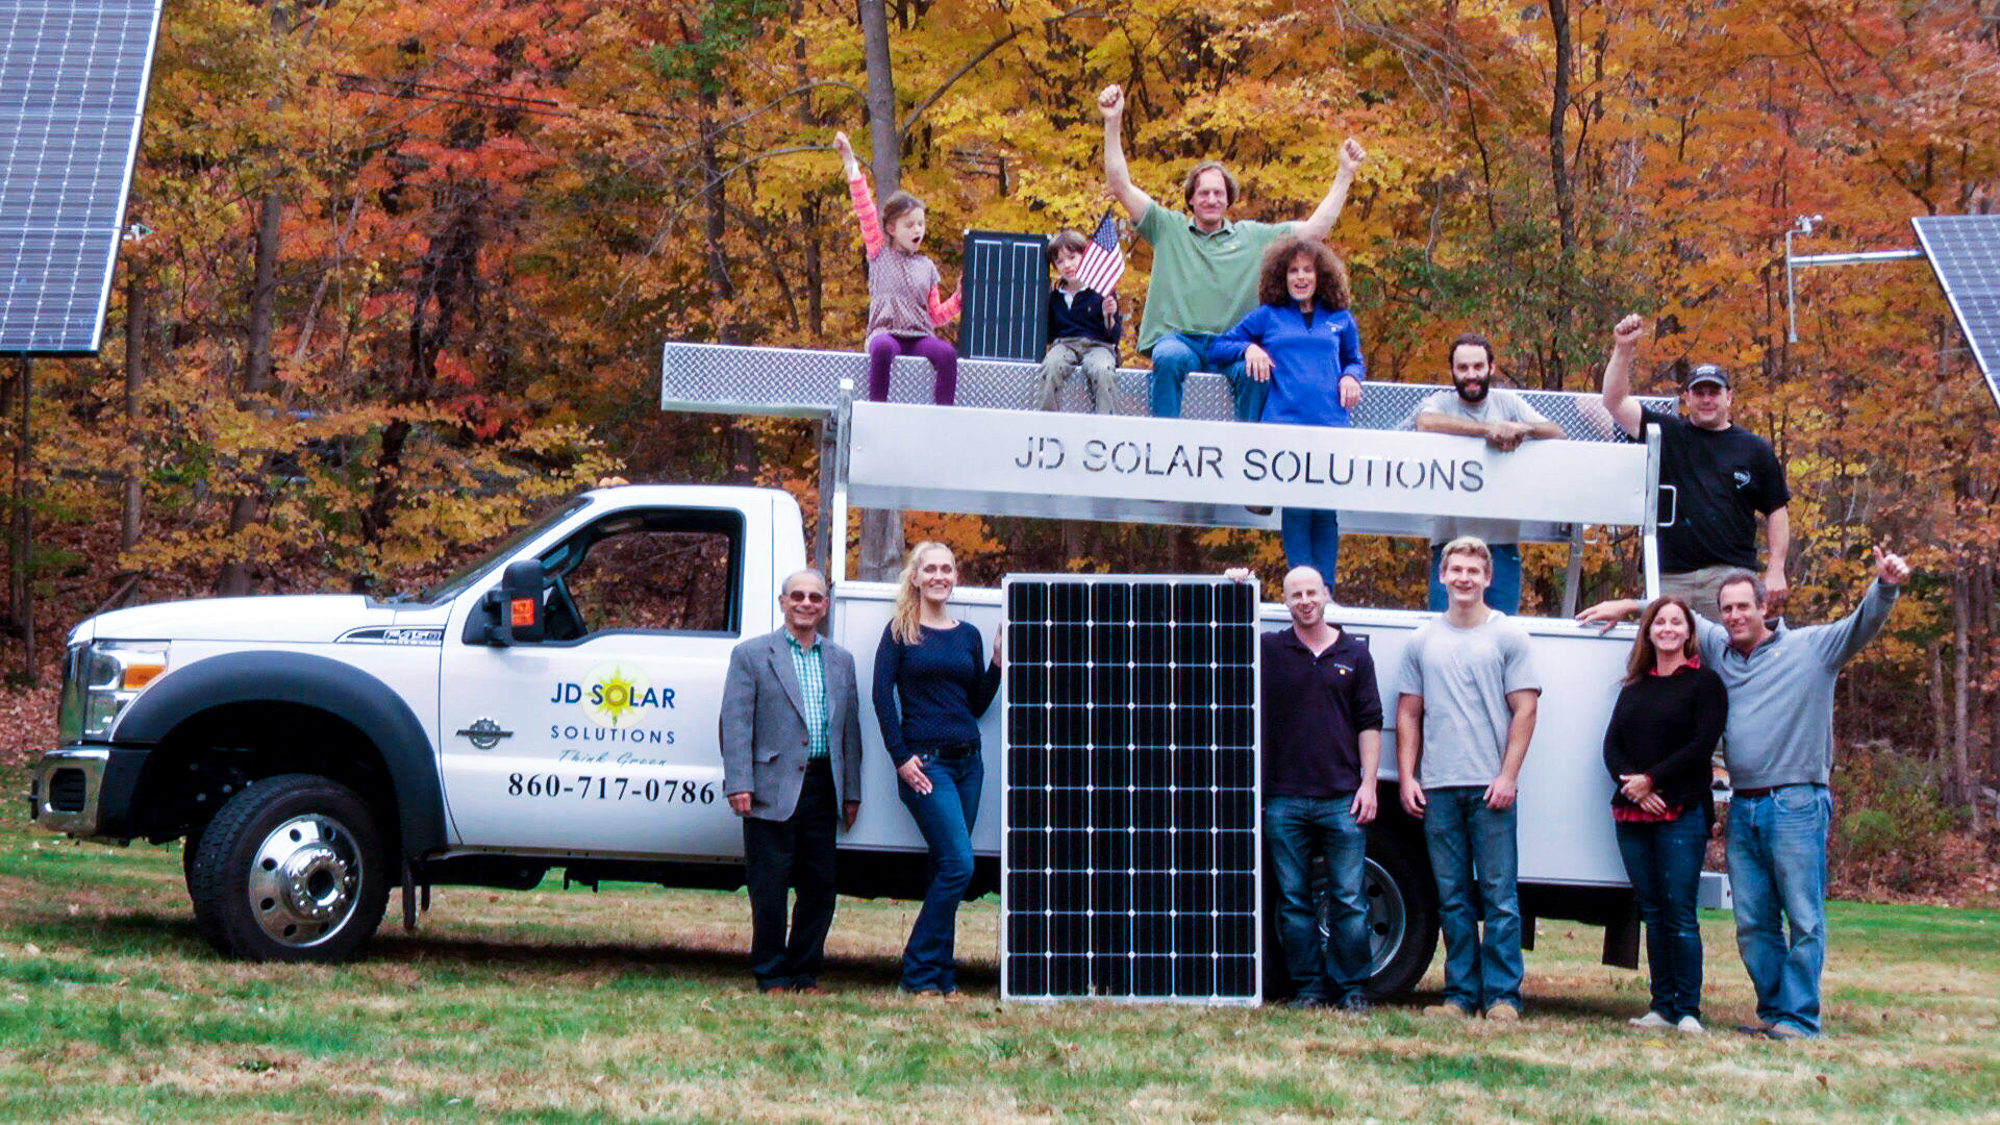 Team JD Solar